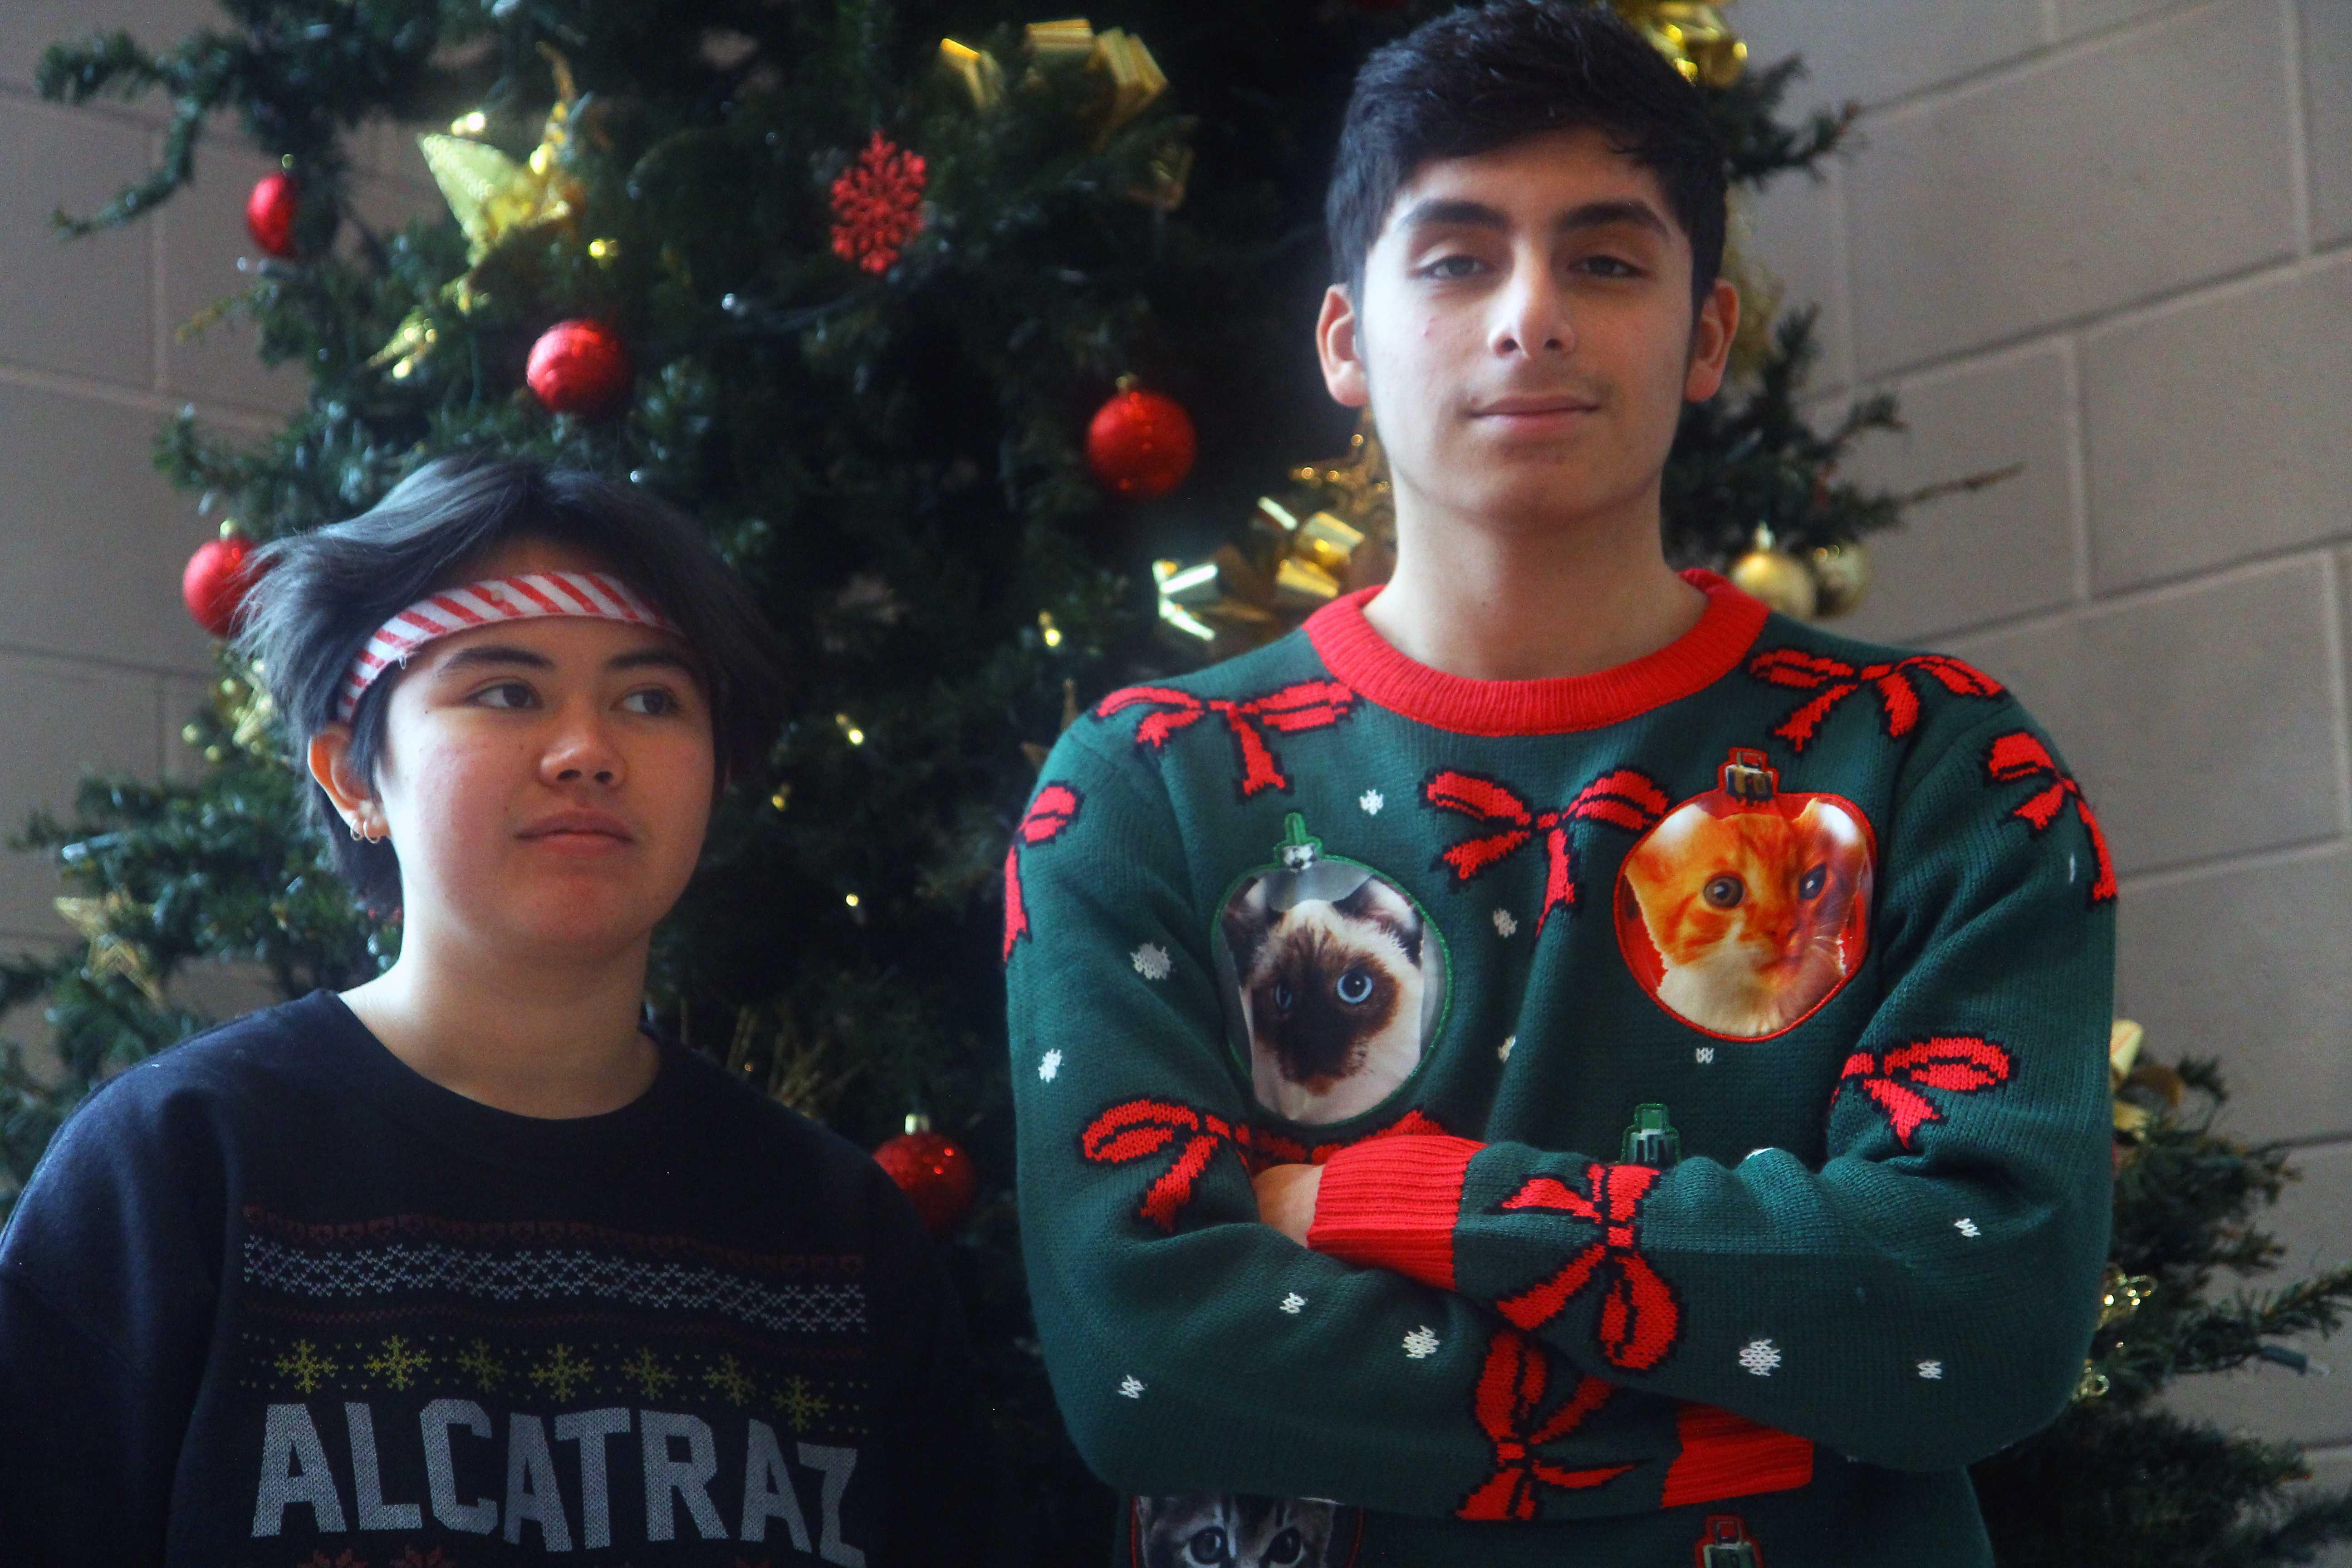 Christmas Dress up slide show